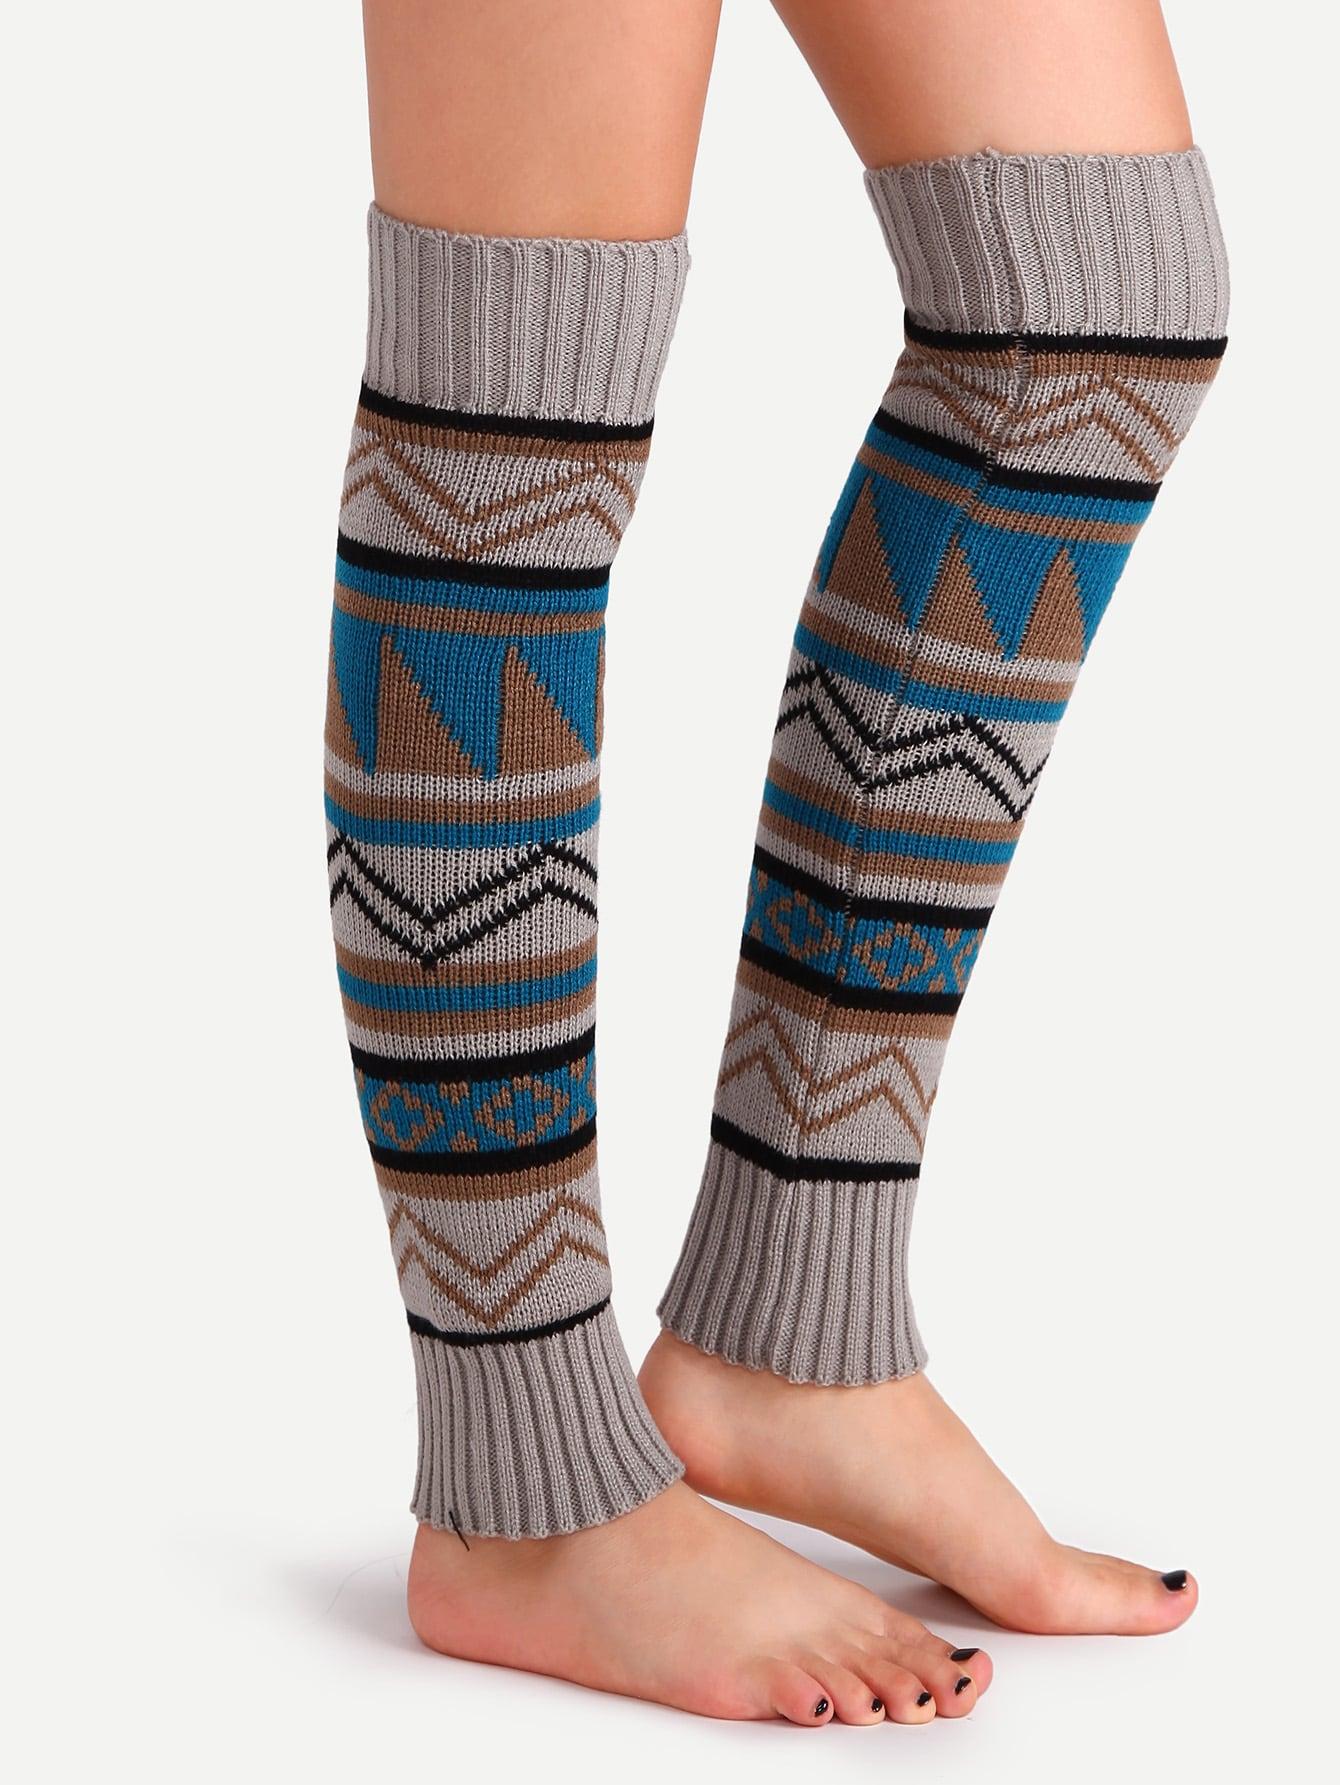 Fall fashion leg warmers How to Wear Leg Warmers KazzTheSpazz